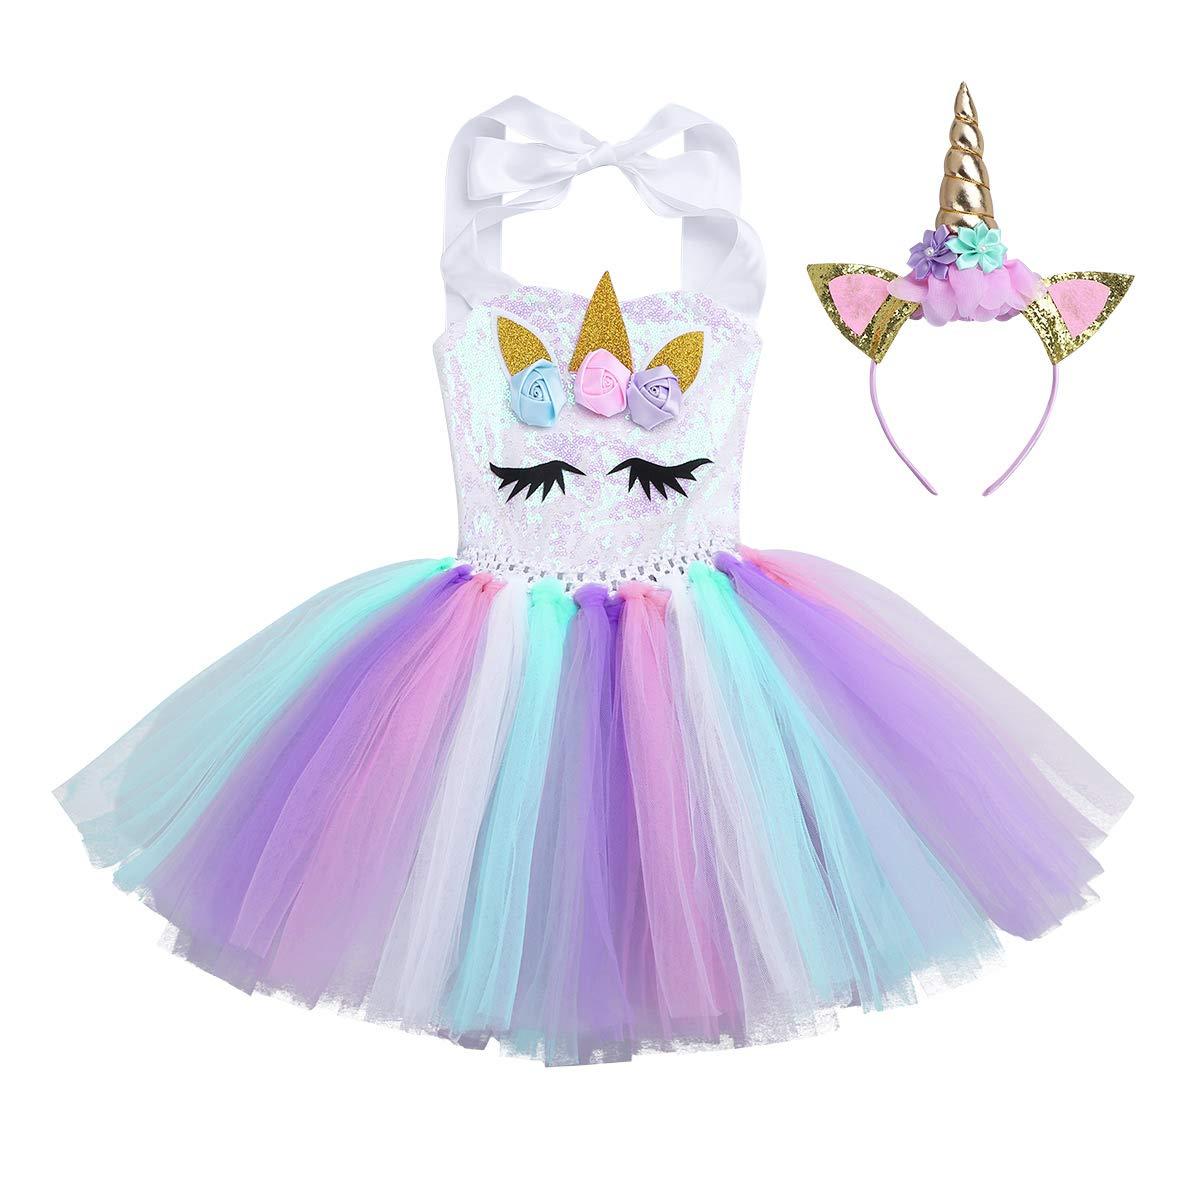 Alvivi Disfraz de Unicornio Niñas Cosplay Costume Infántil para ...